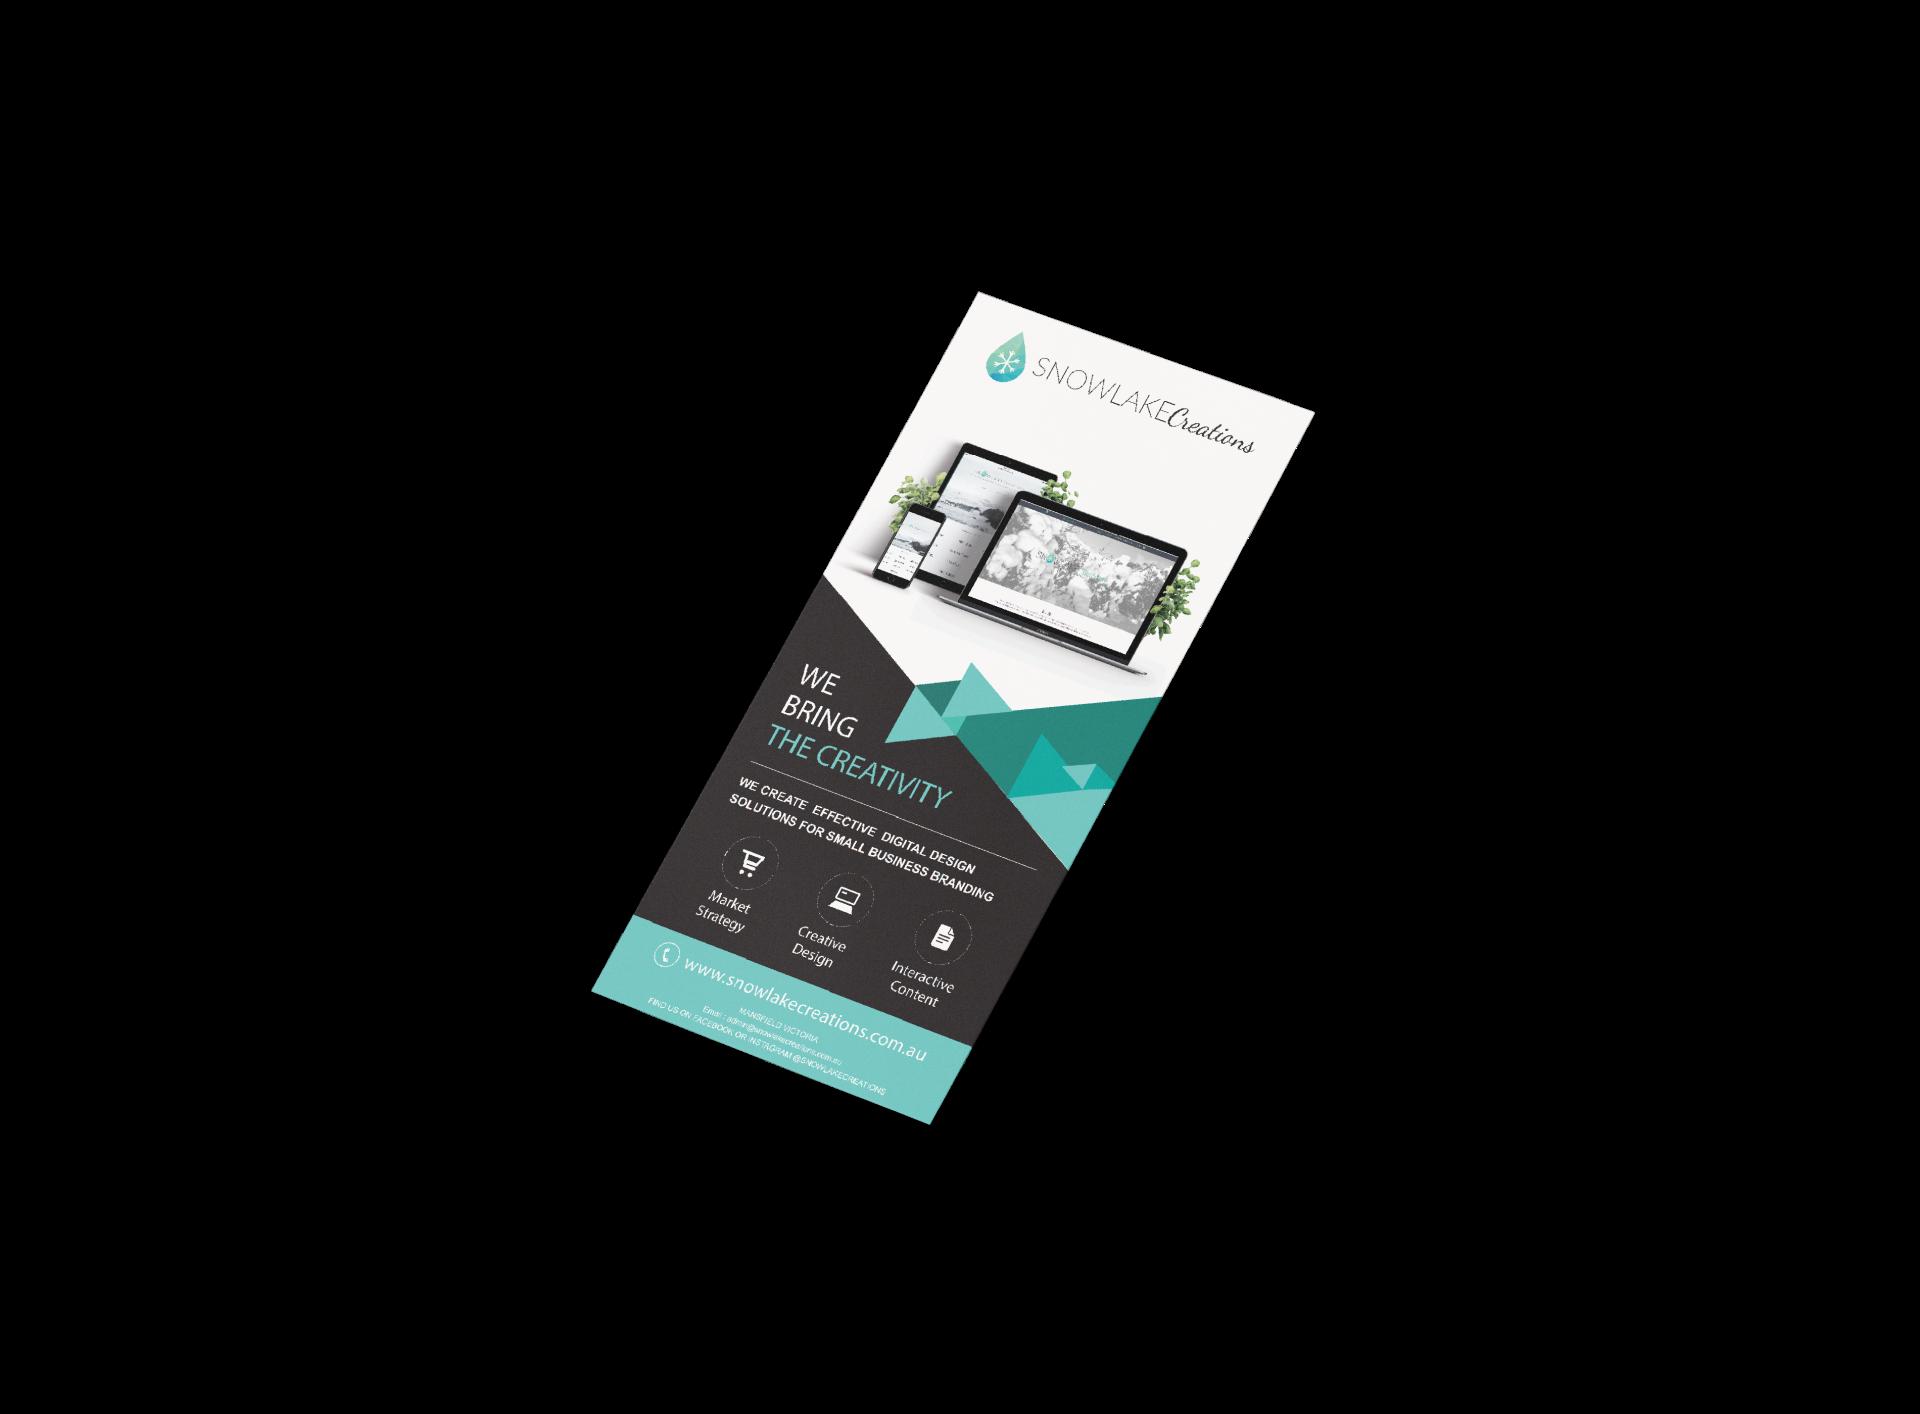 SnowLake Marketing Design offers design services for marketin